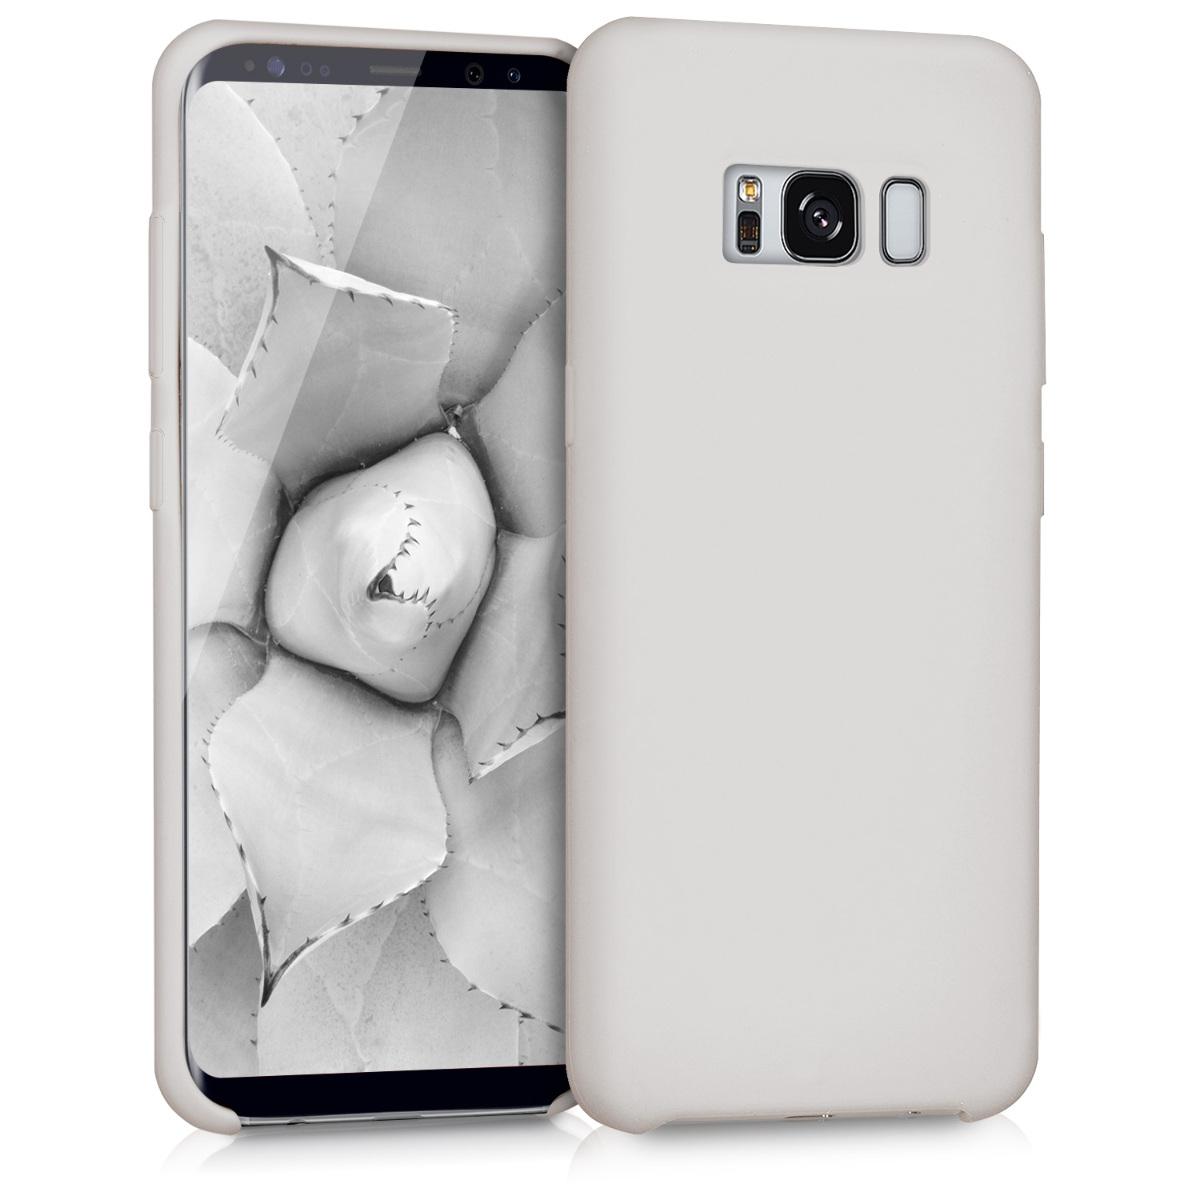 KW TPU Θήκη Σιλικόνης Samsung Galaxy S8 - Soft Flexible Rubber Protective Cover - Beige (41853.11)